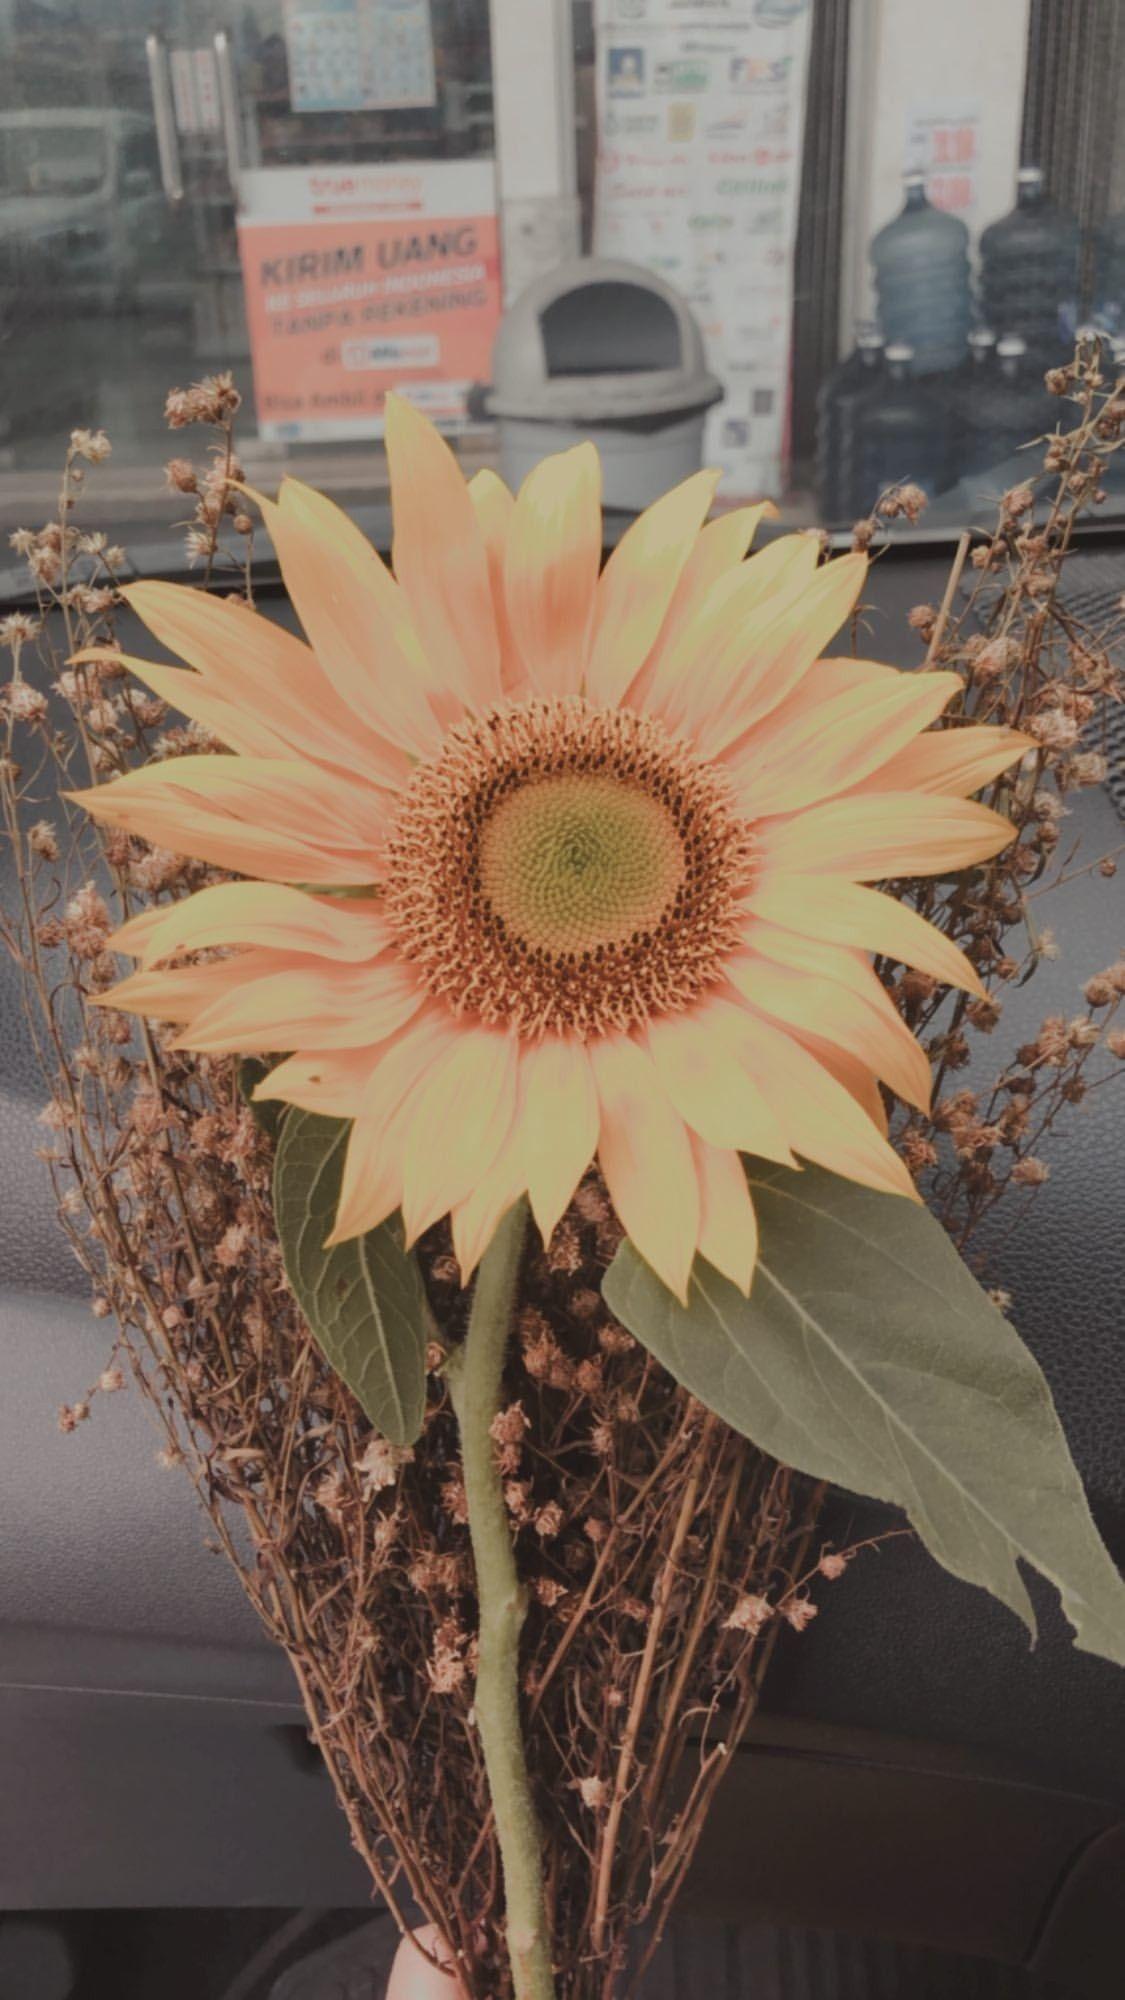 Pin Oleh Dila Diana Di Flower Poster Bunga Fotografi Bunga Lukisan Bunga Matahari